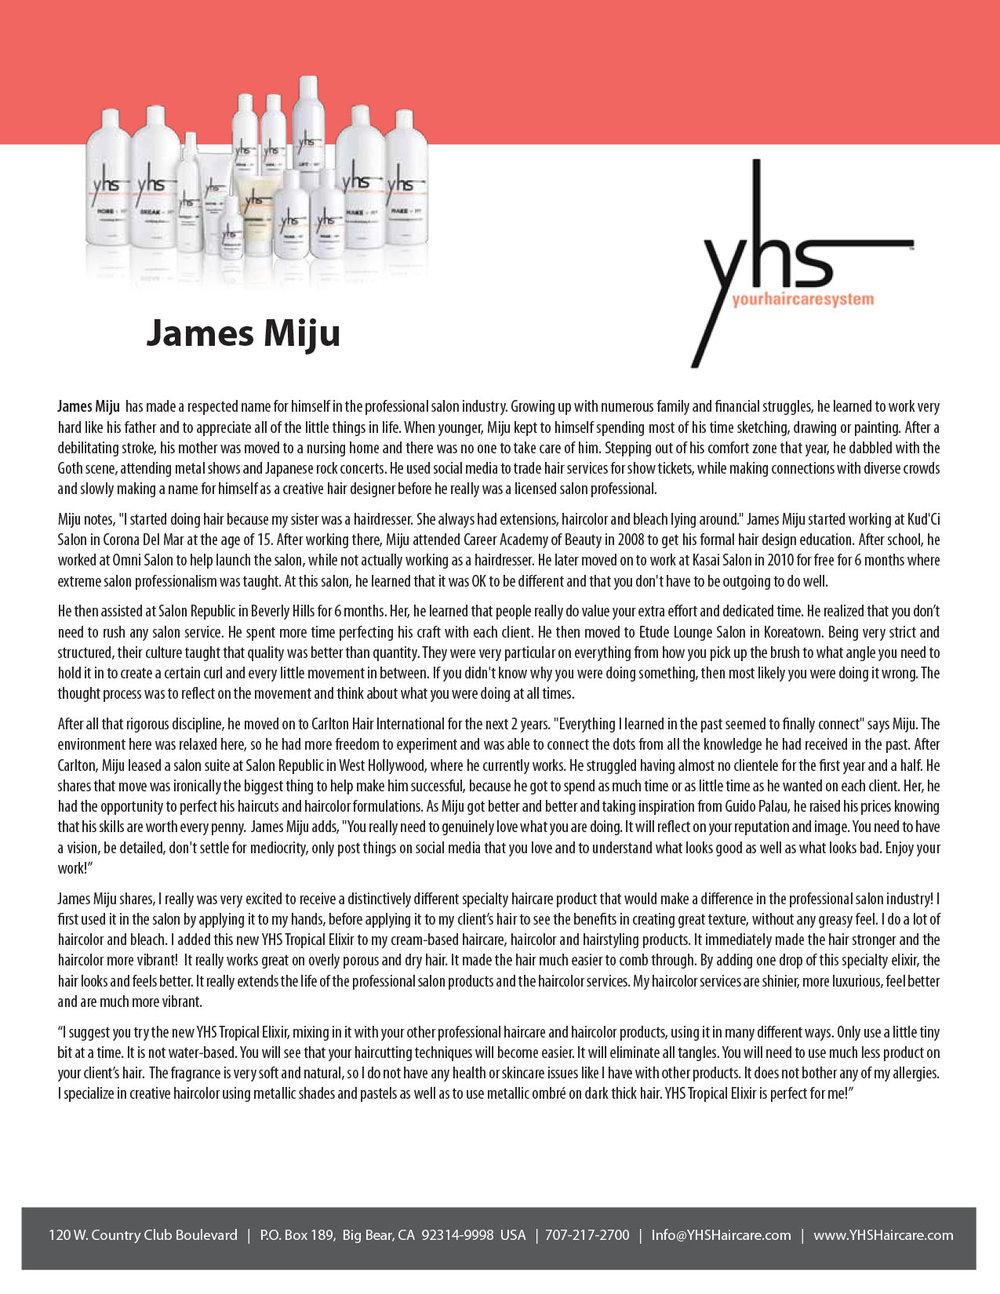 James Miju Testimonial – YHS Haircare